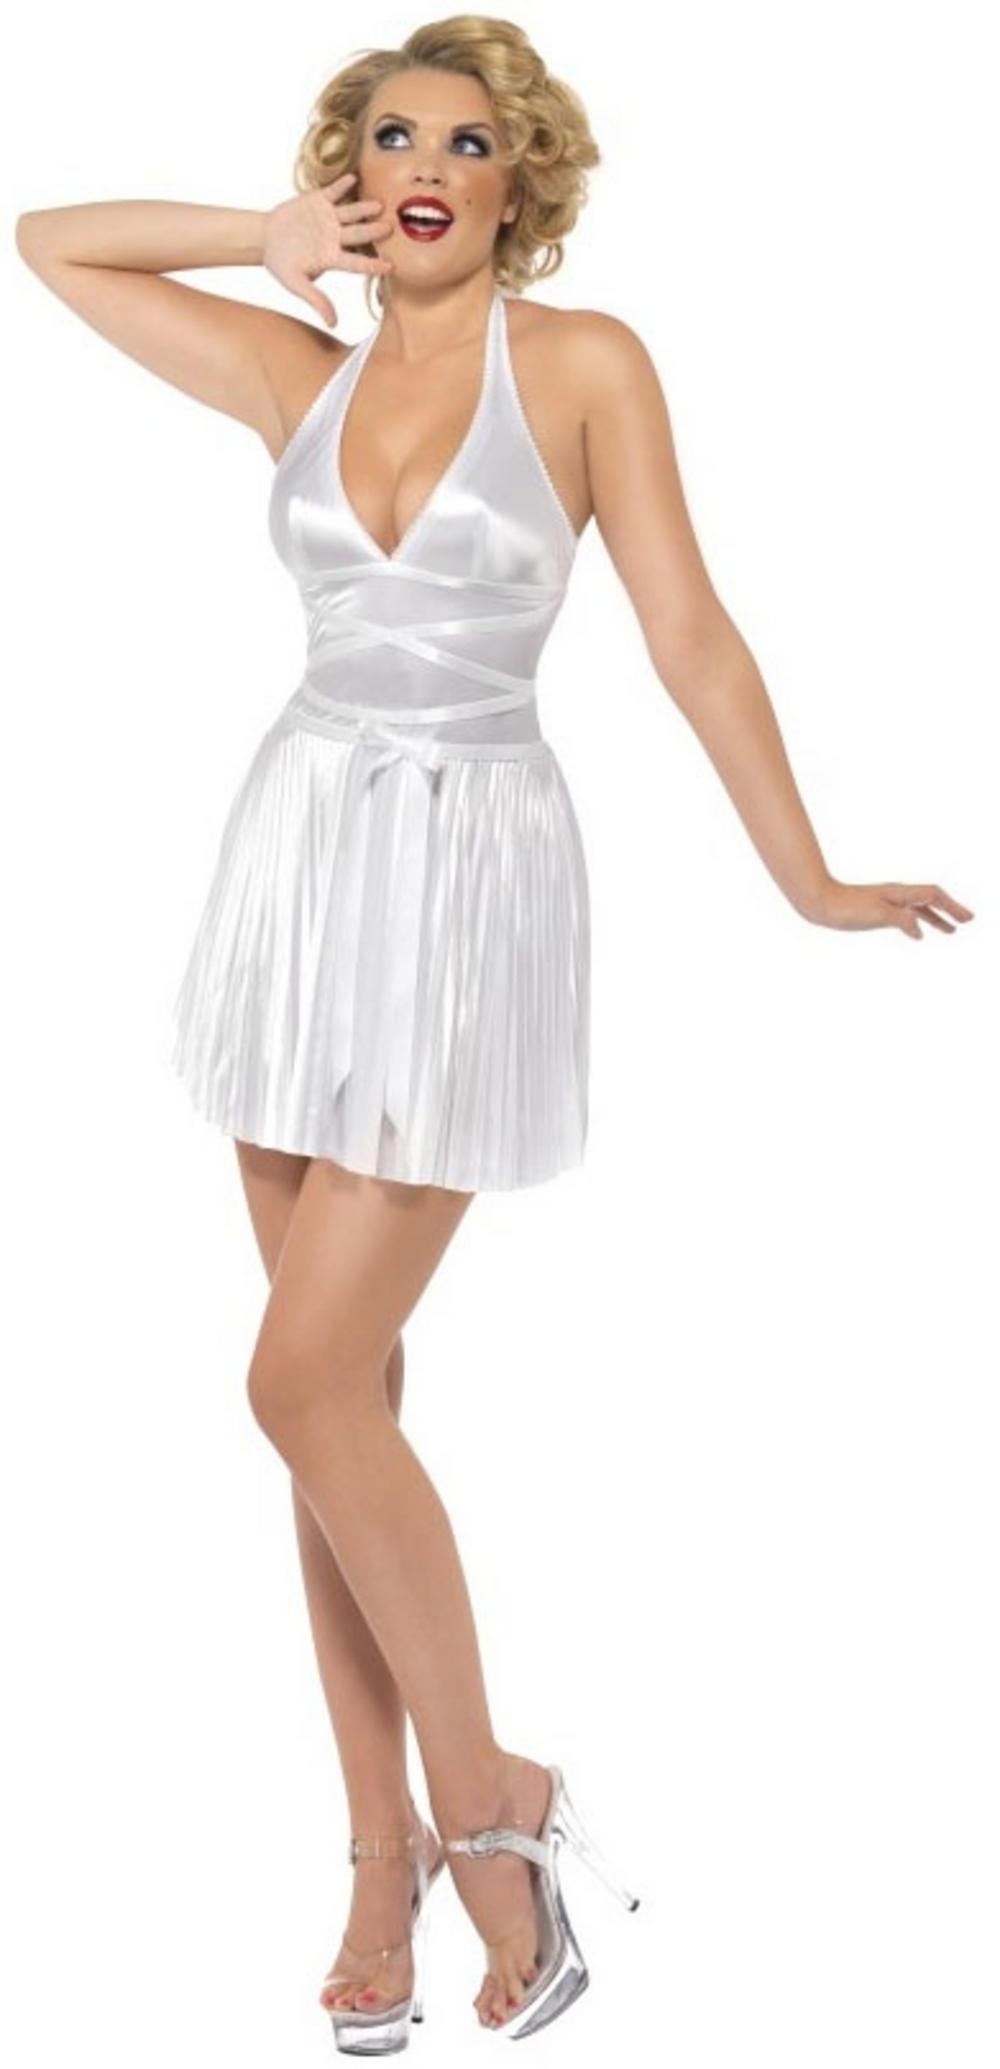 Ideas For A Fancy Dress Party  sc 1 st  Bunny Pudding Hops - WordPress.com & Ideas For A Fancy Dress Party | Bunny Pudding Hops